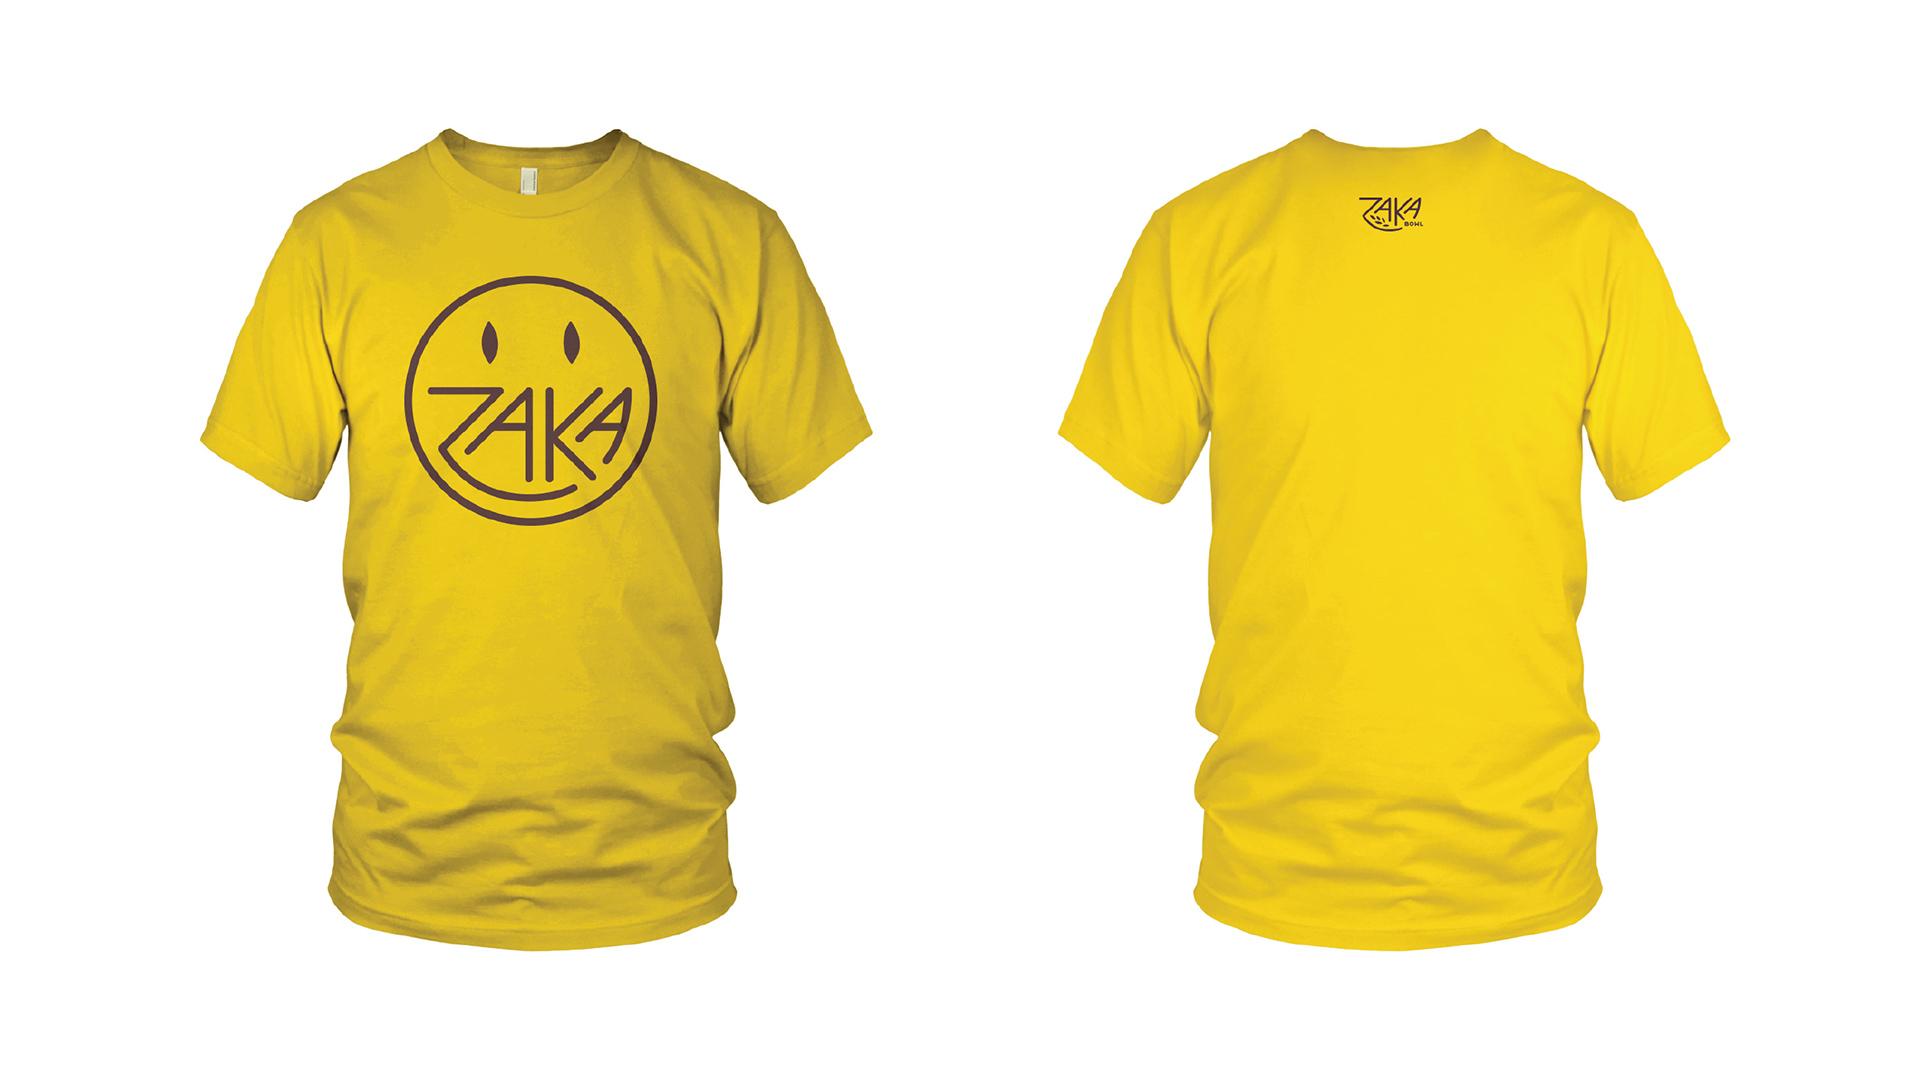 ZKB-Tee-Mockup-03.jpg